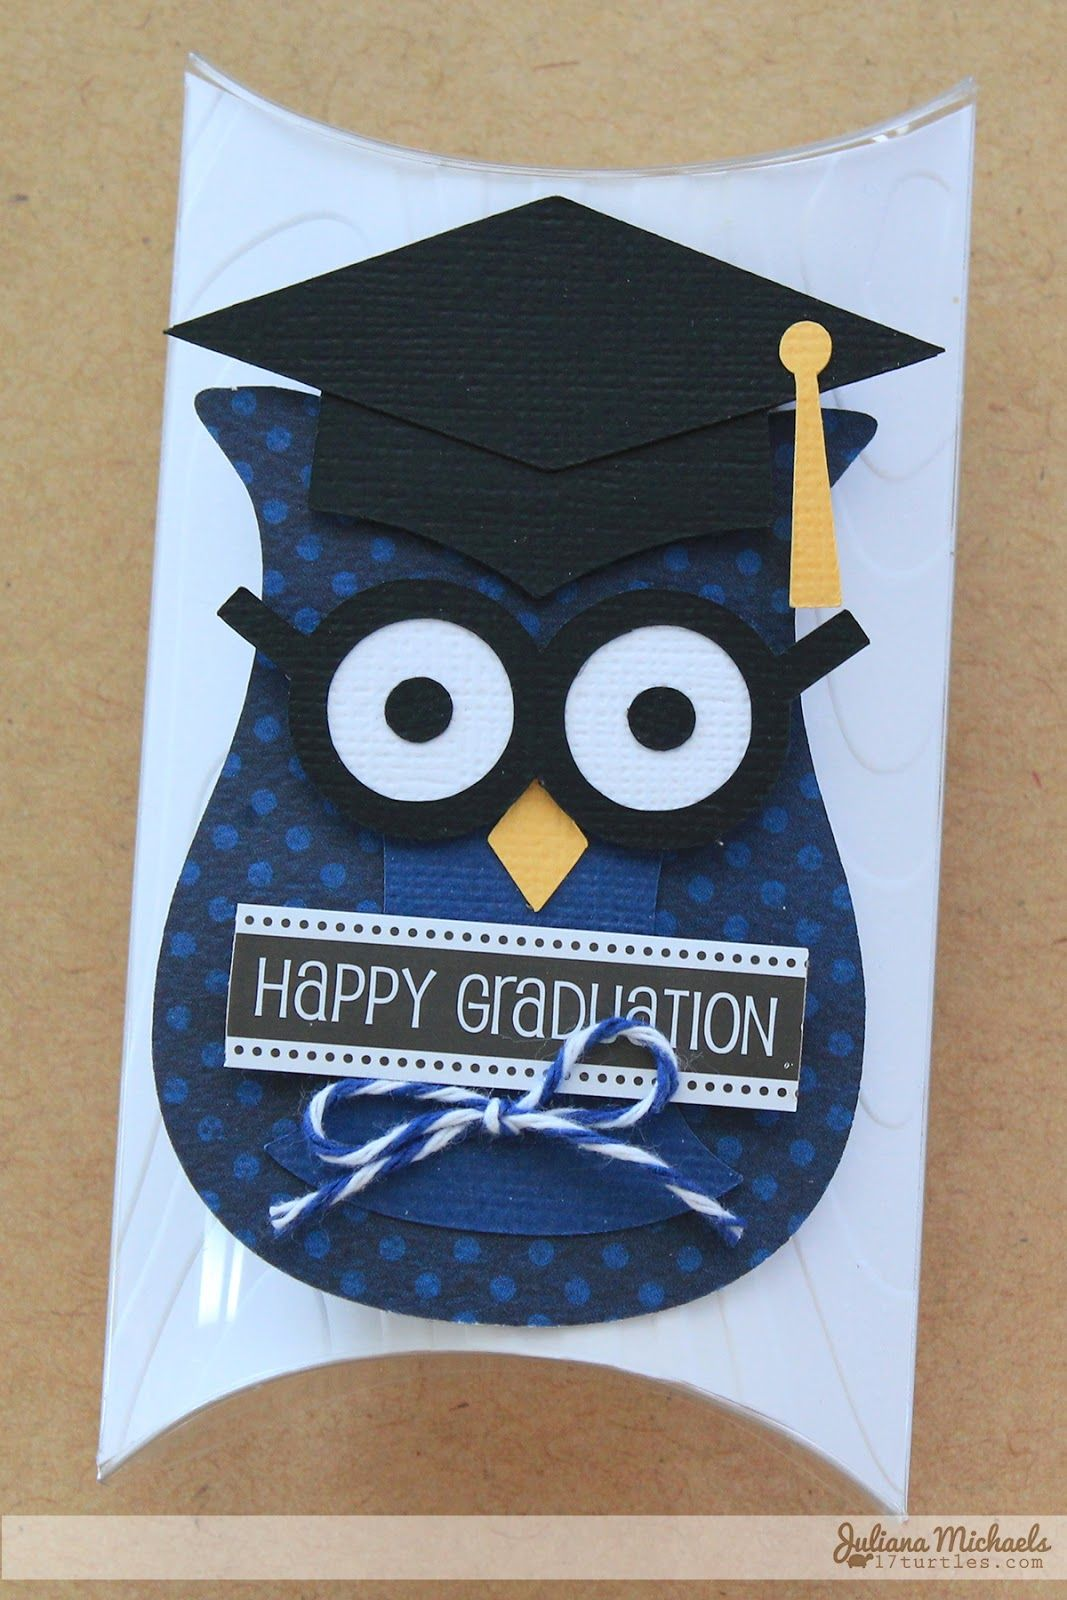 Hoot! Hoot! Happy Graduation Gift Card Holder using SRM Stickers Graduation DIY Kit #srmstickers #giftcardholder #graduation